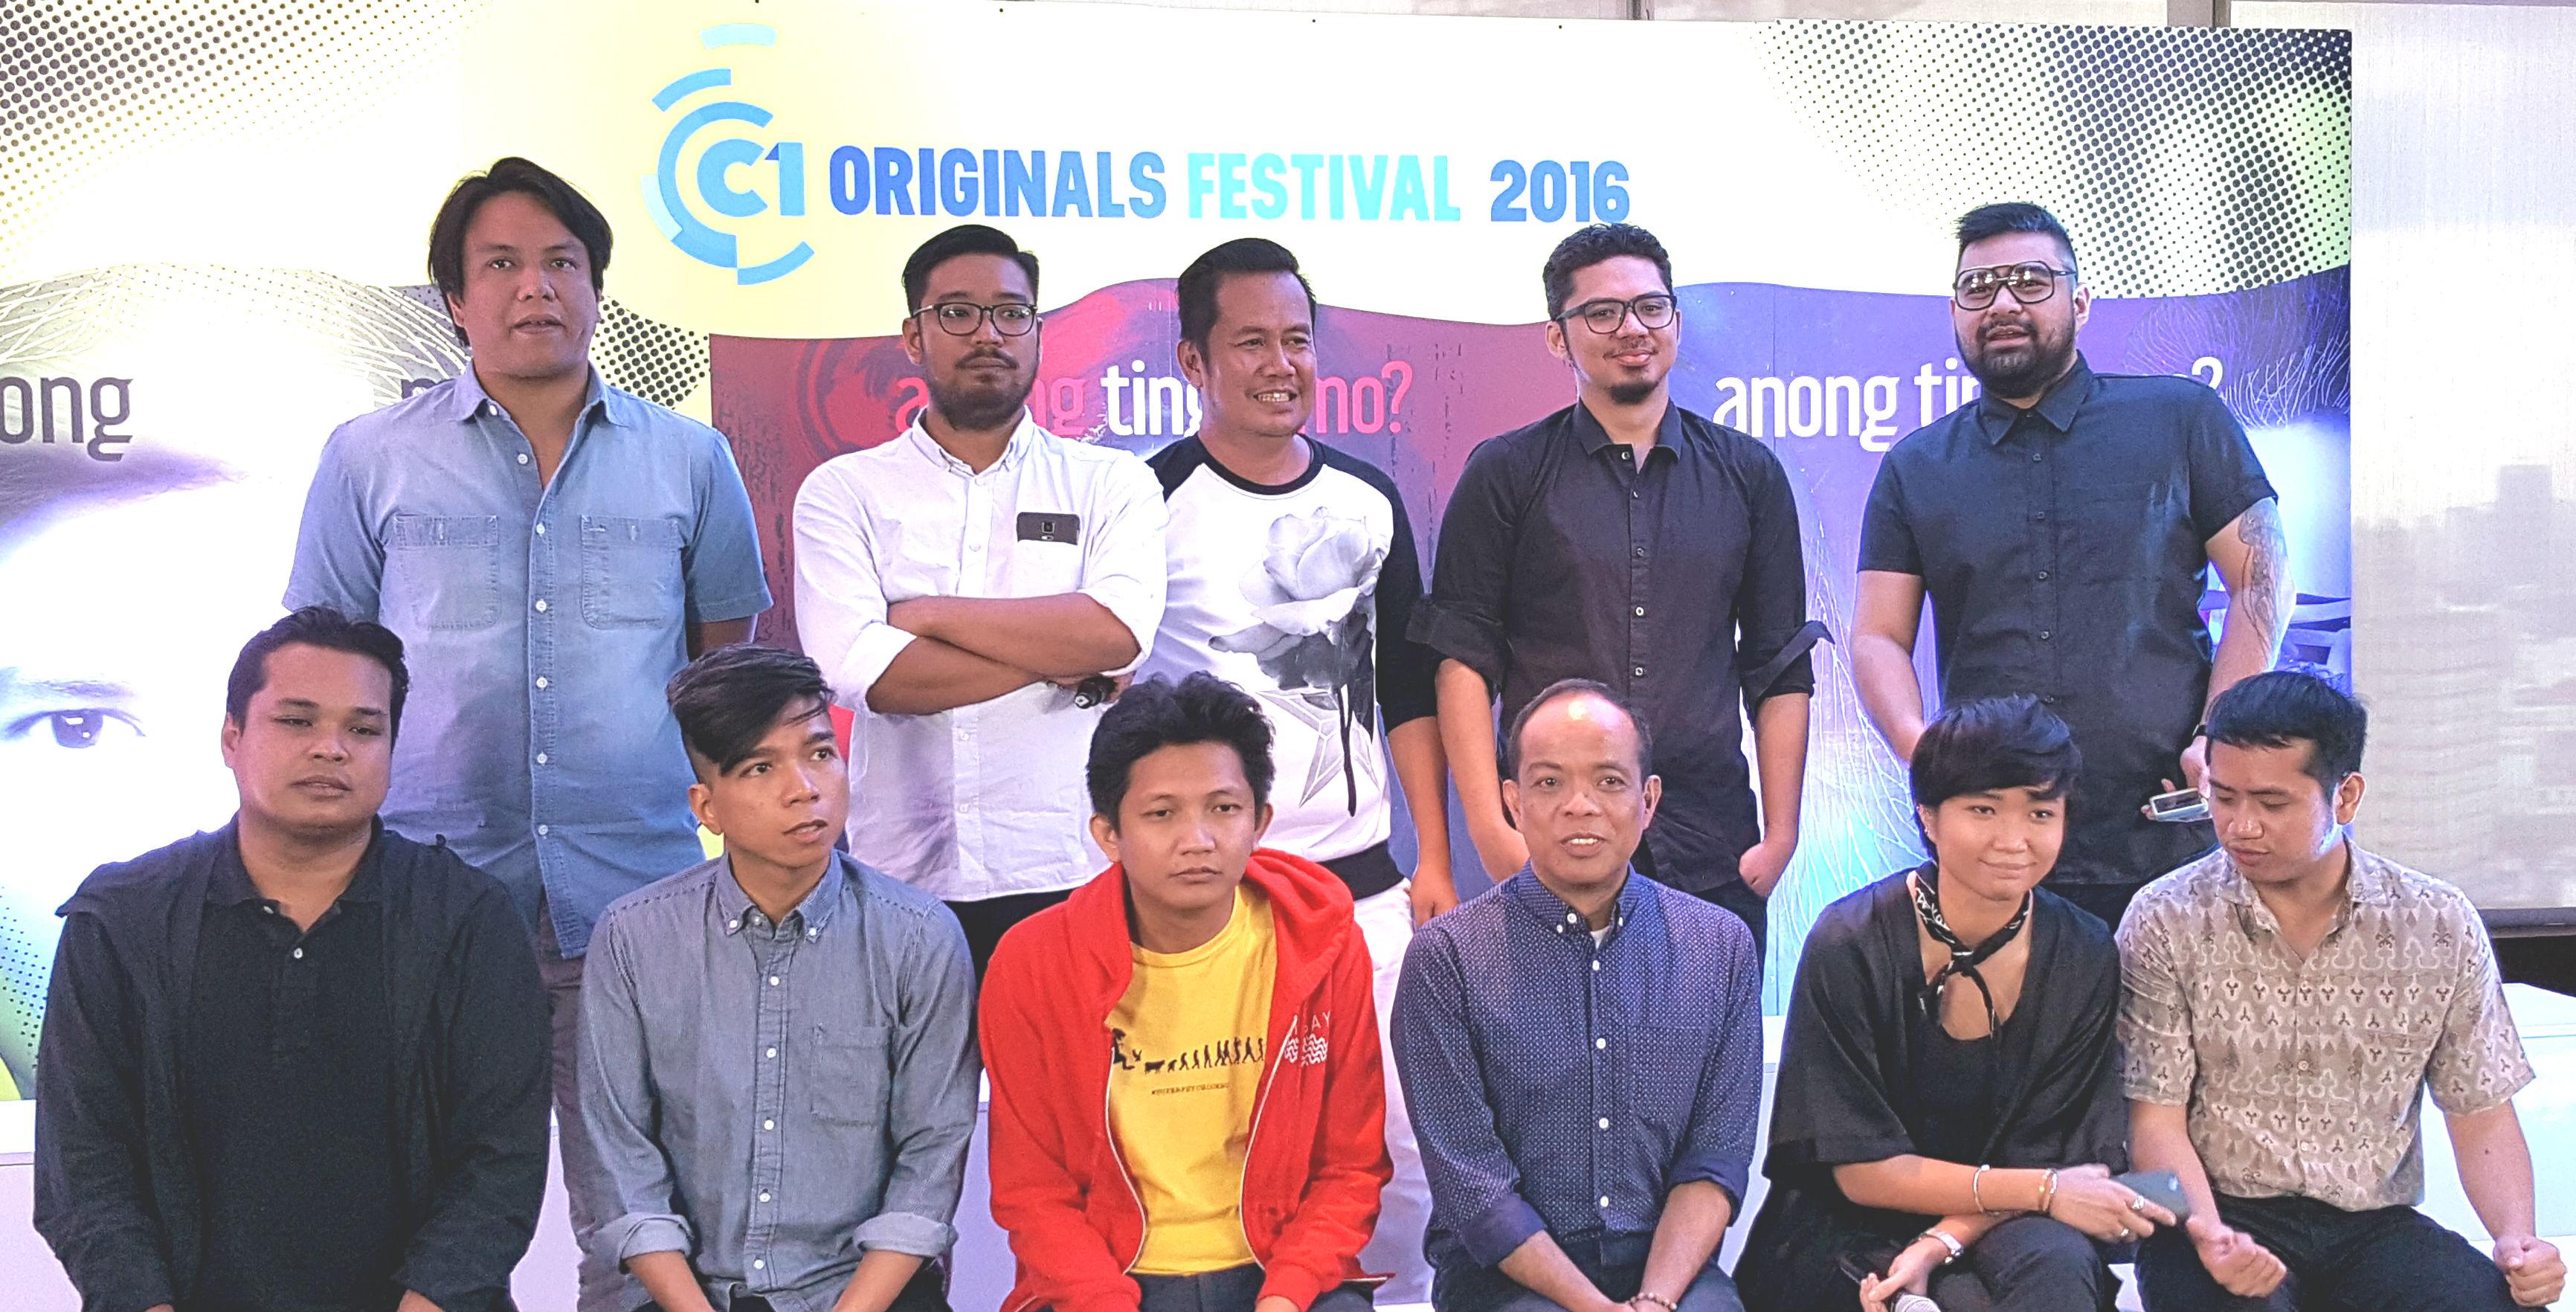 The directors of this year's Cinema One Originals. Photo by Alexa Villano/Rappler